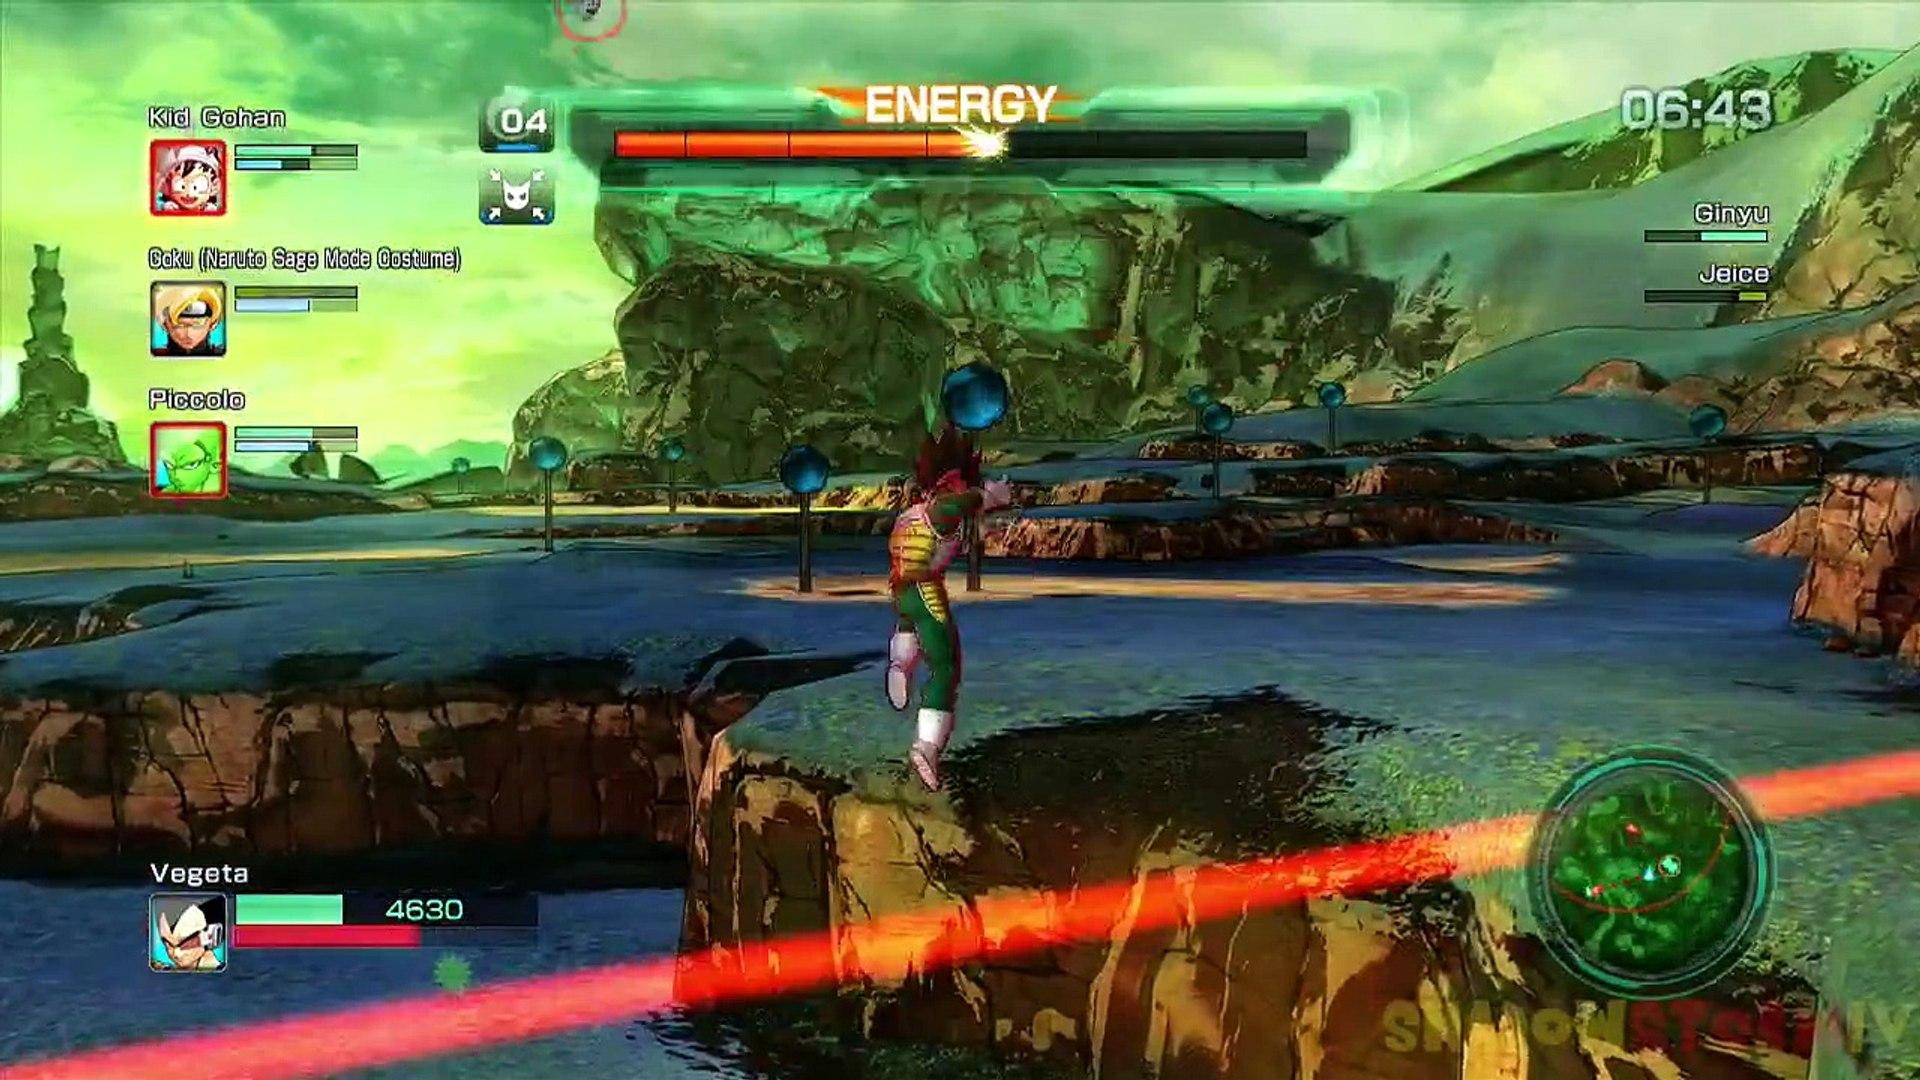 Dragon Ball Z Battle of Z Gameplay Walkthrough Part 9 | Frieza Saga |ドラゴンボールZ バトルのゼット